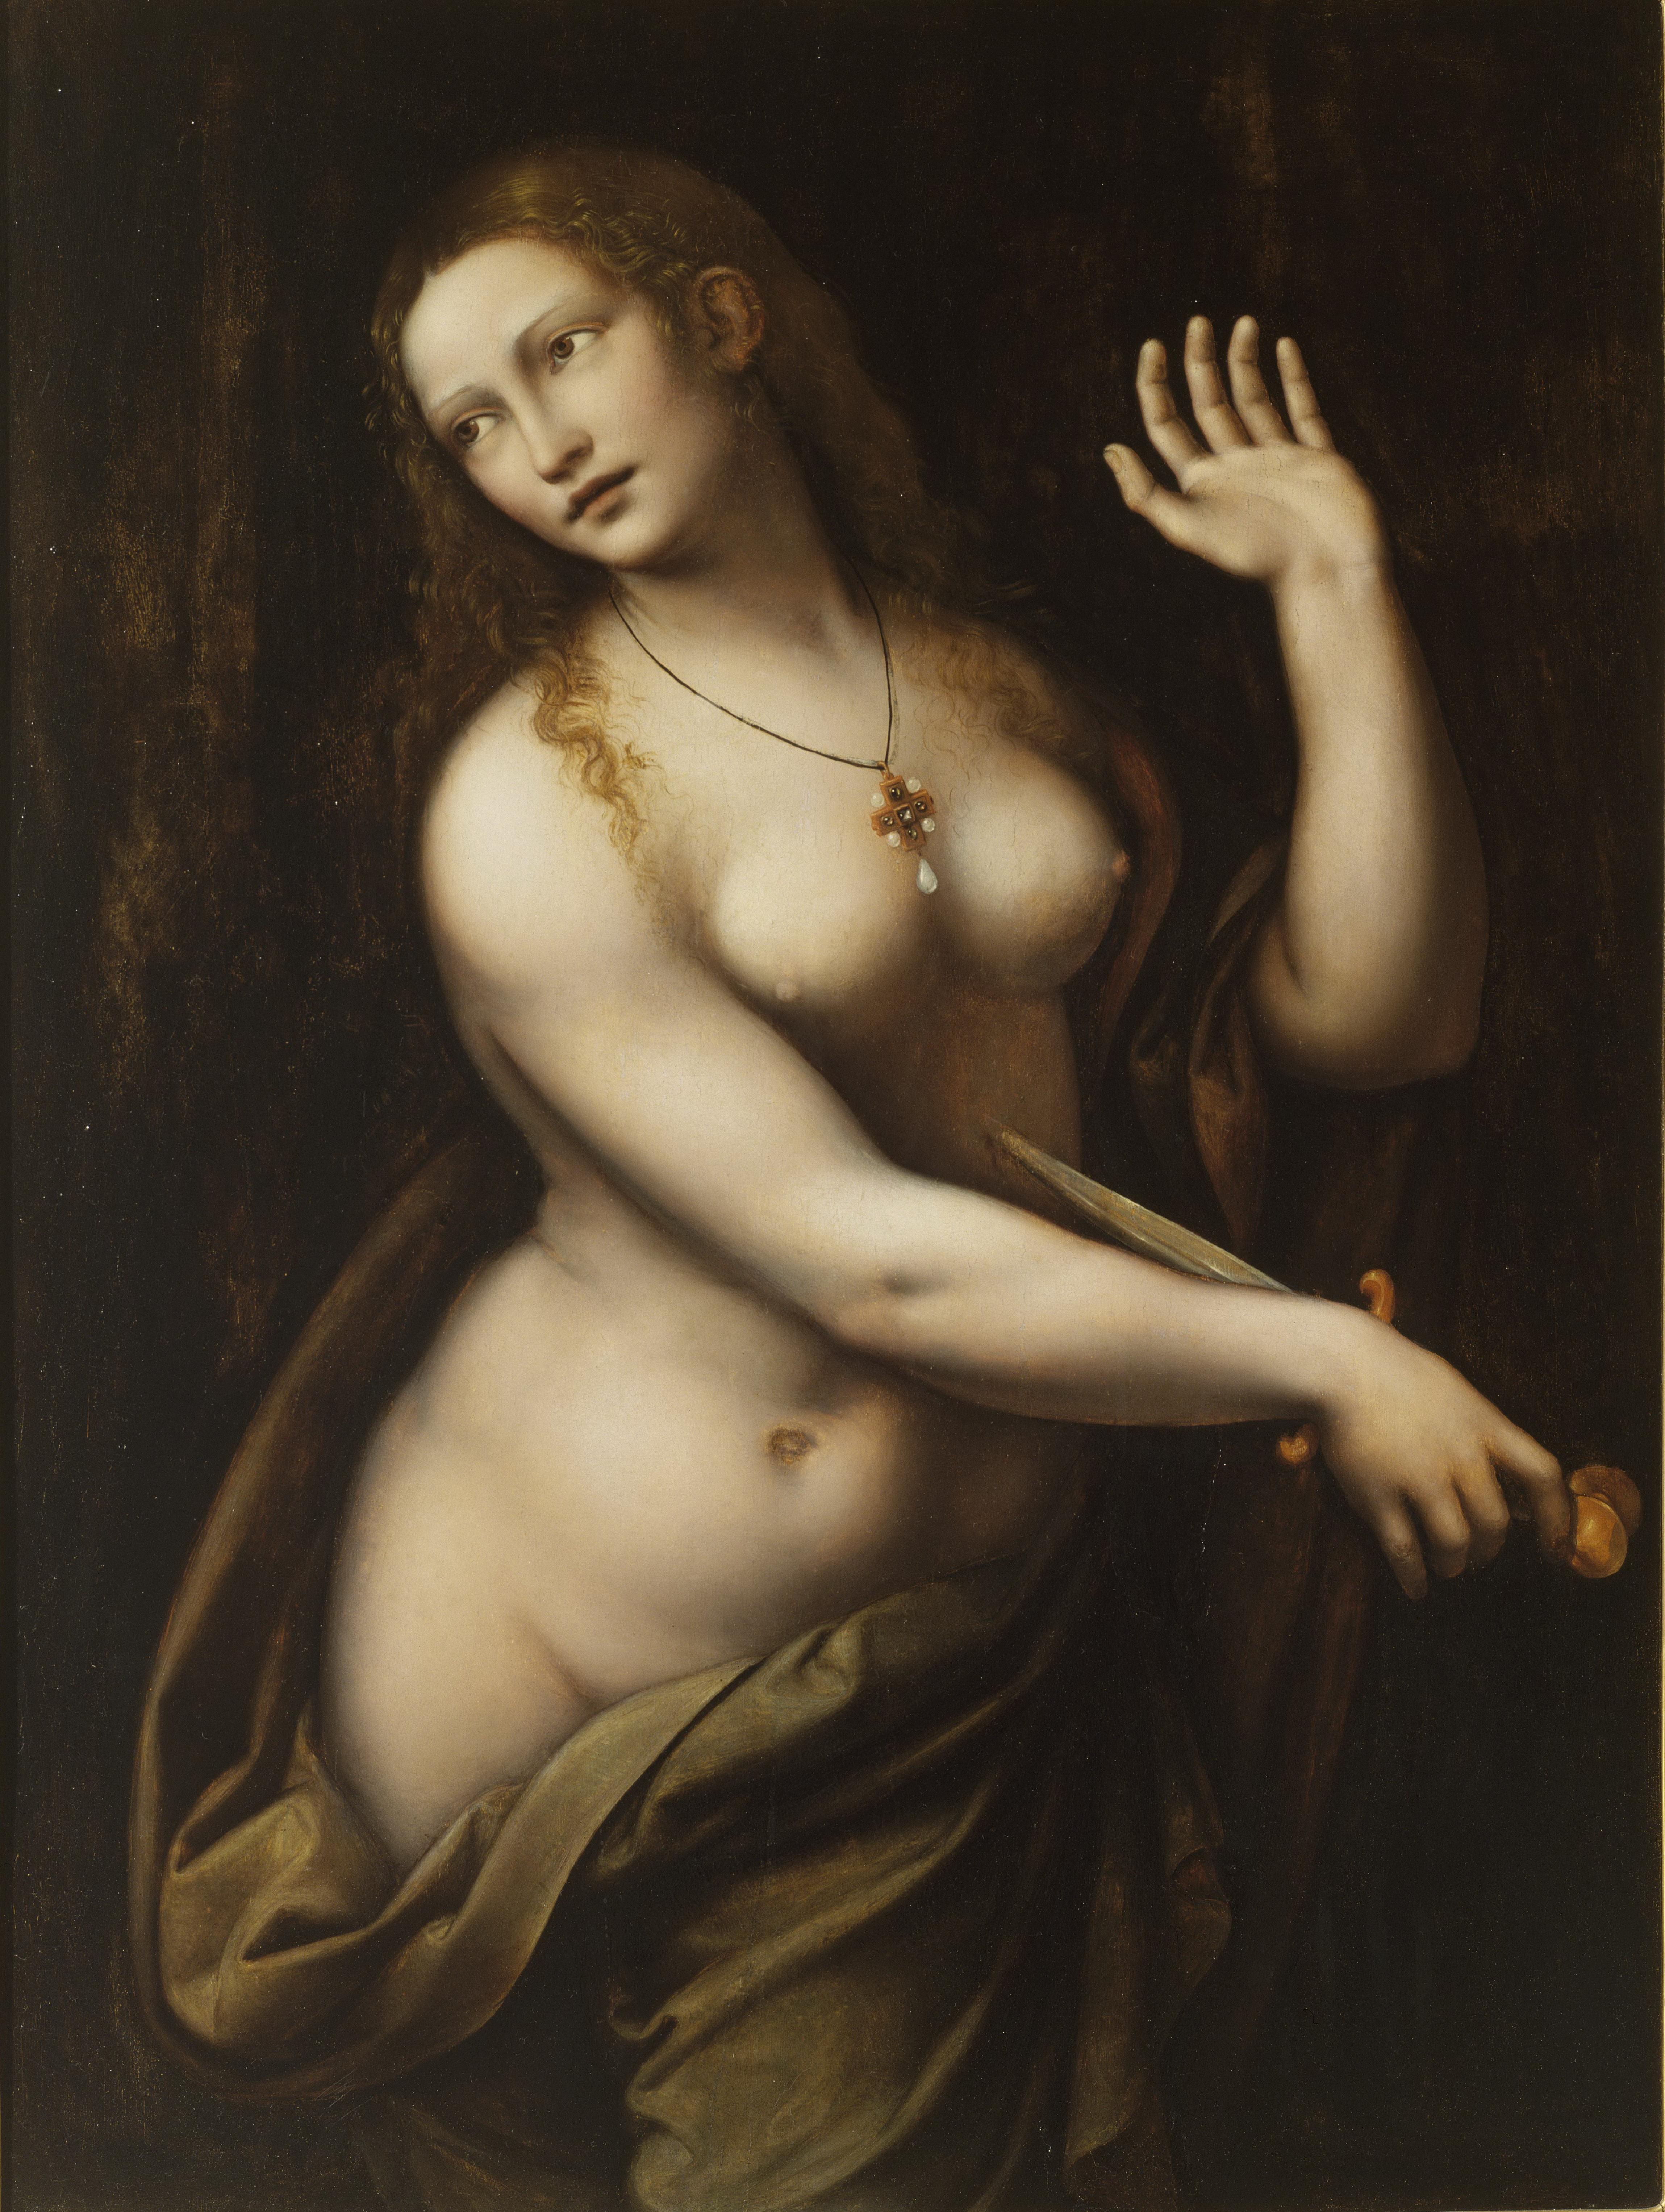 Giampetrino, 1495-1549. Лукреция. между 1500 и 1540. 95.9 х 72.4. США, Мадисон, Chazen Museum of Art